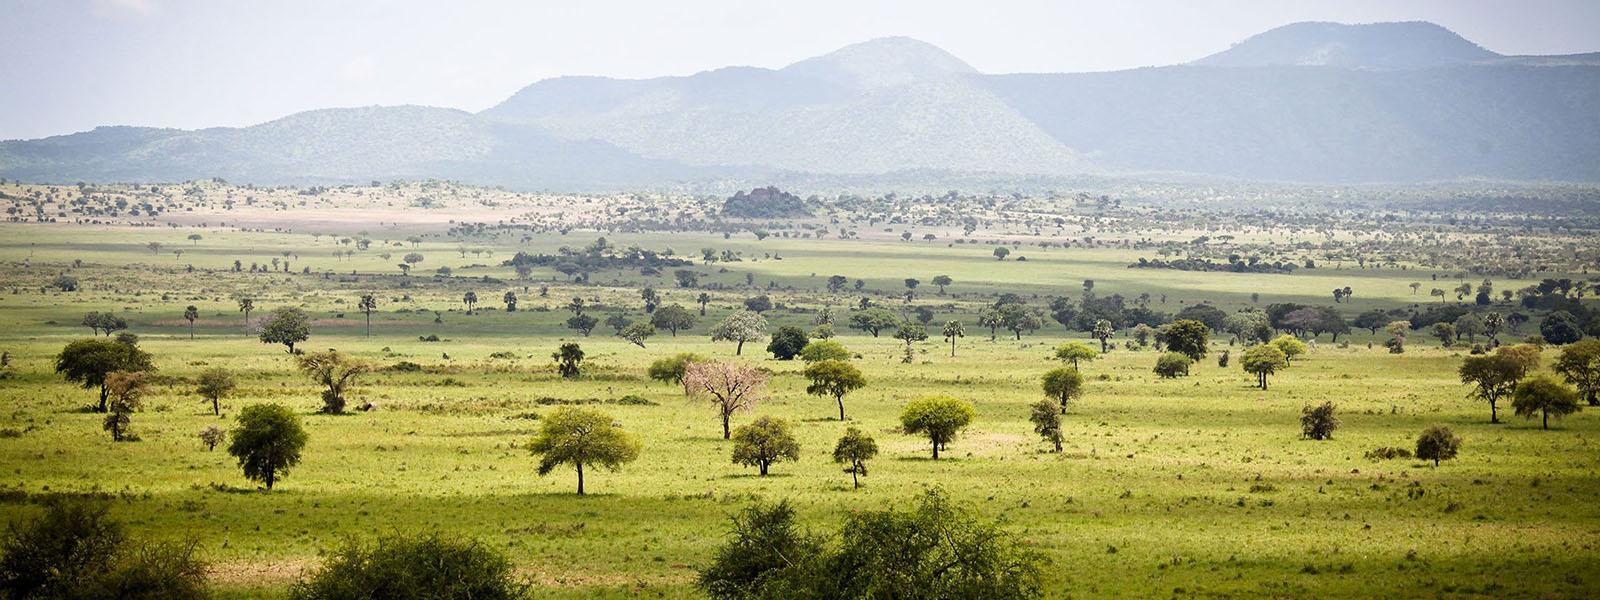 Uganda Travel Destinations